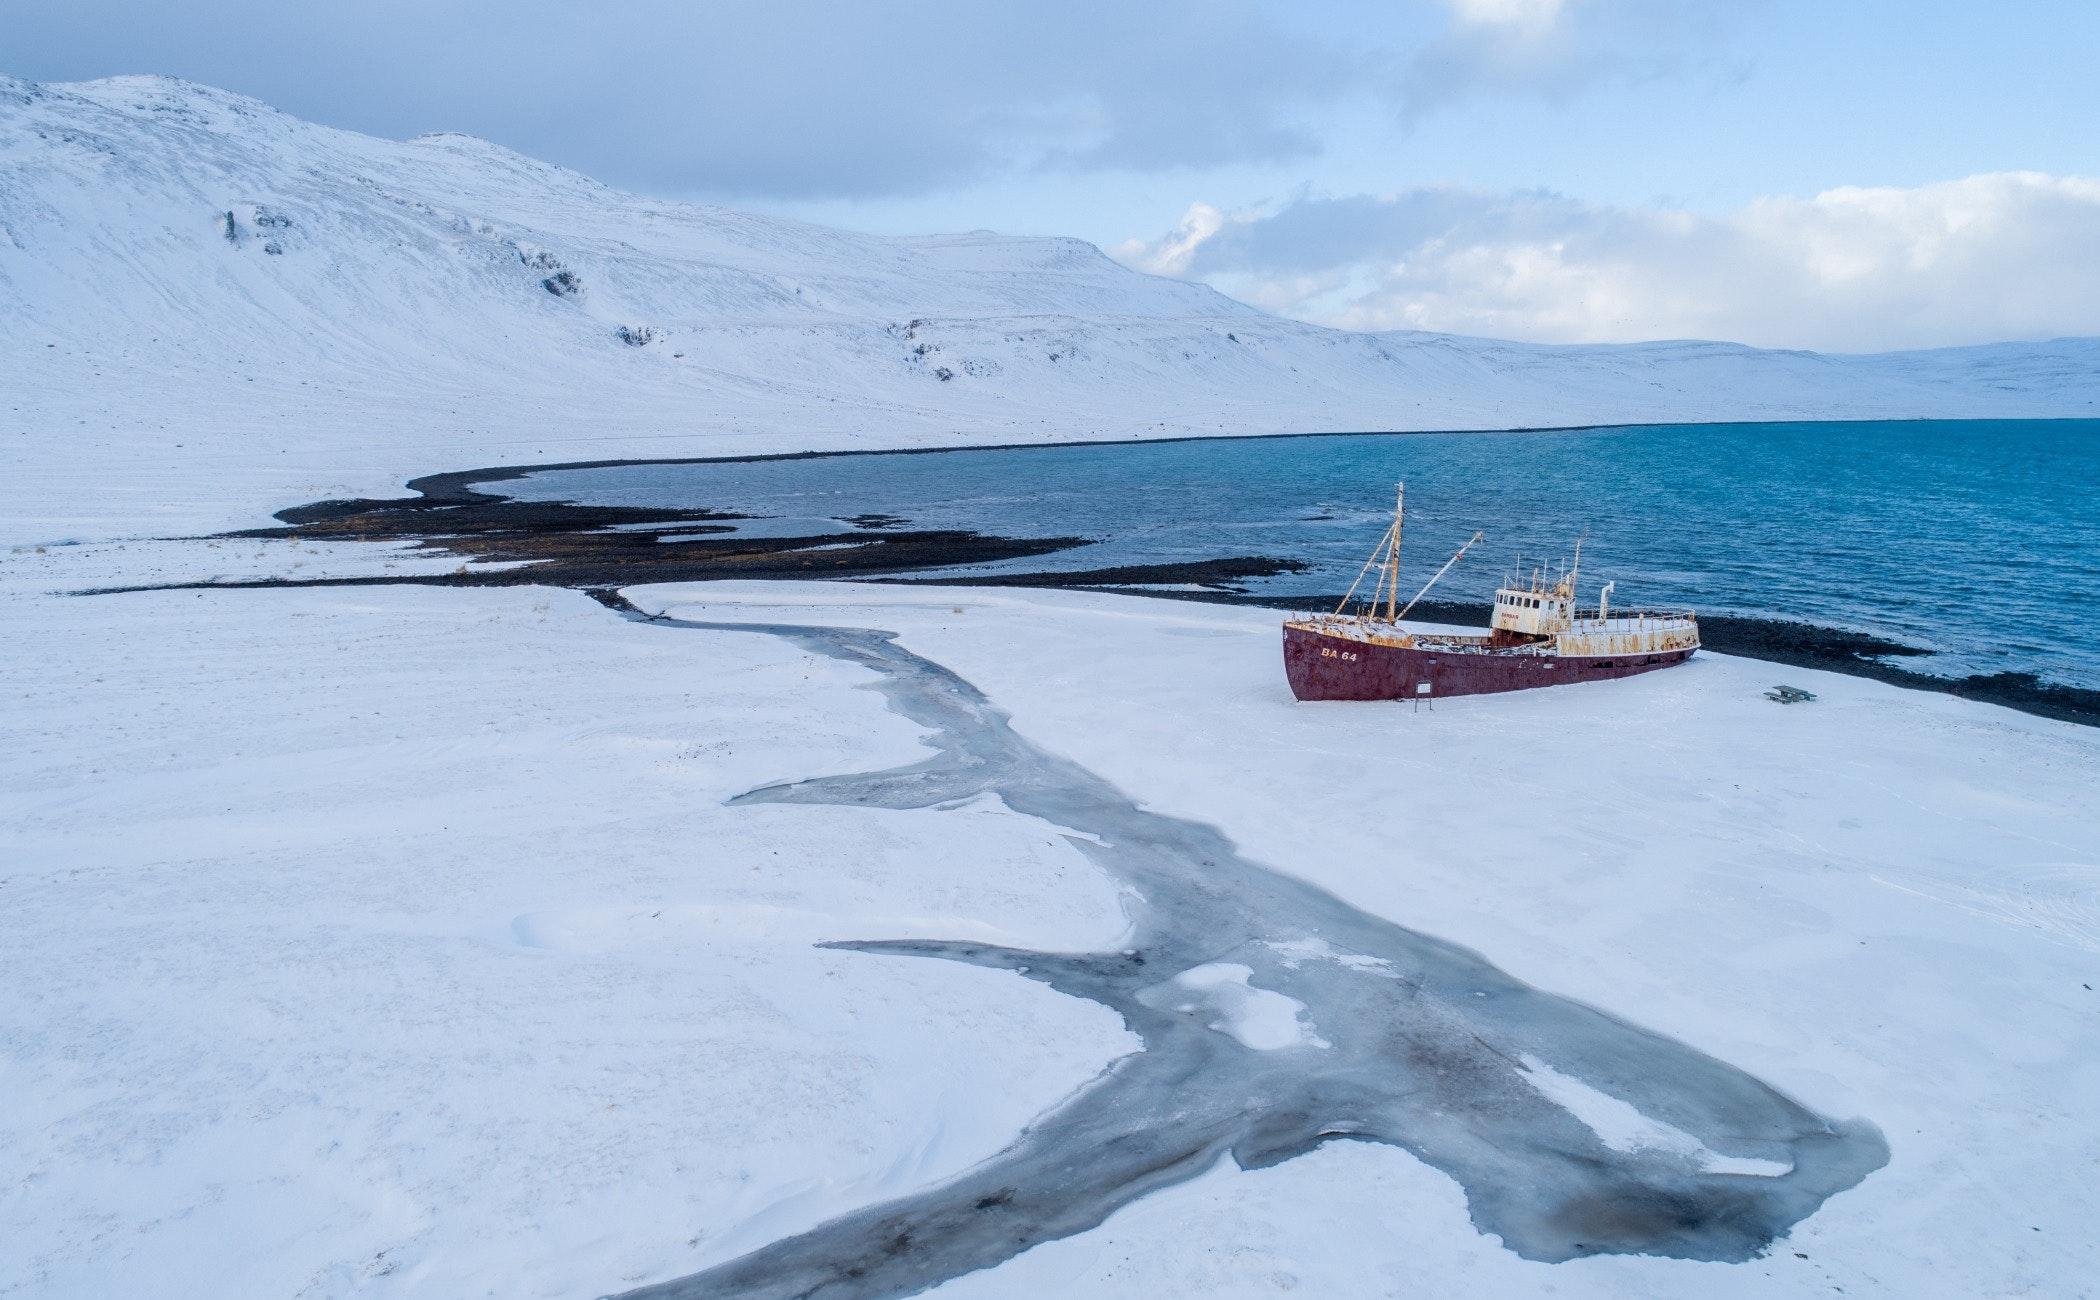 transportation,vessel,vehicle,watercraft,boat,outdoors,nature,ice,ship